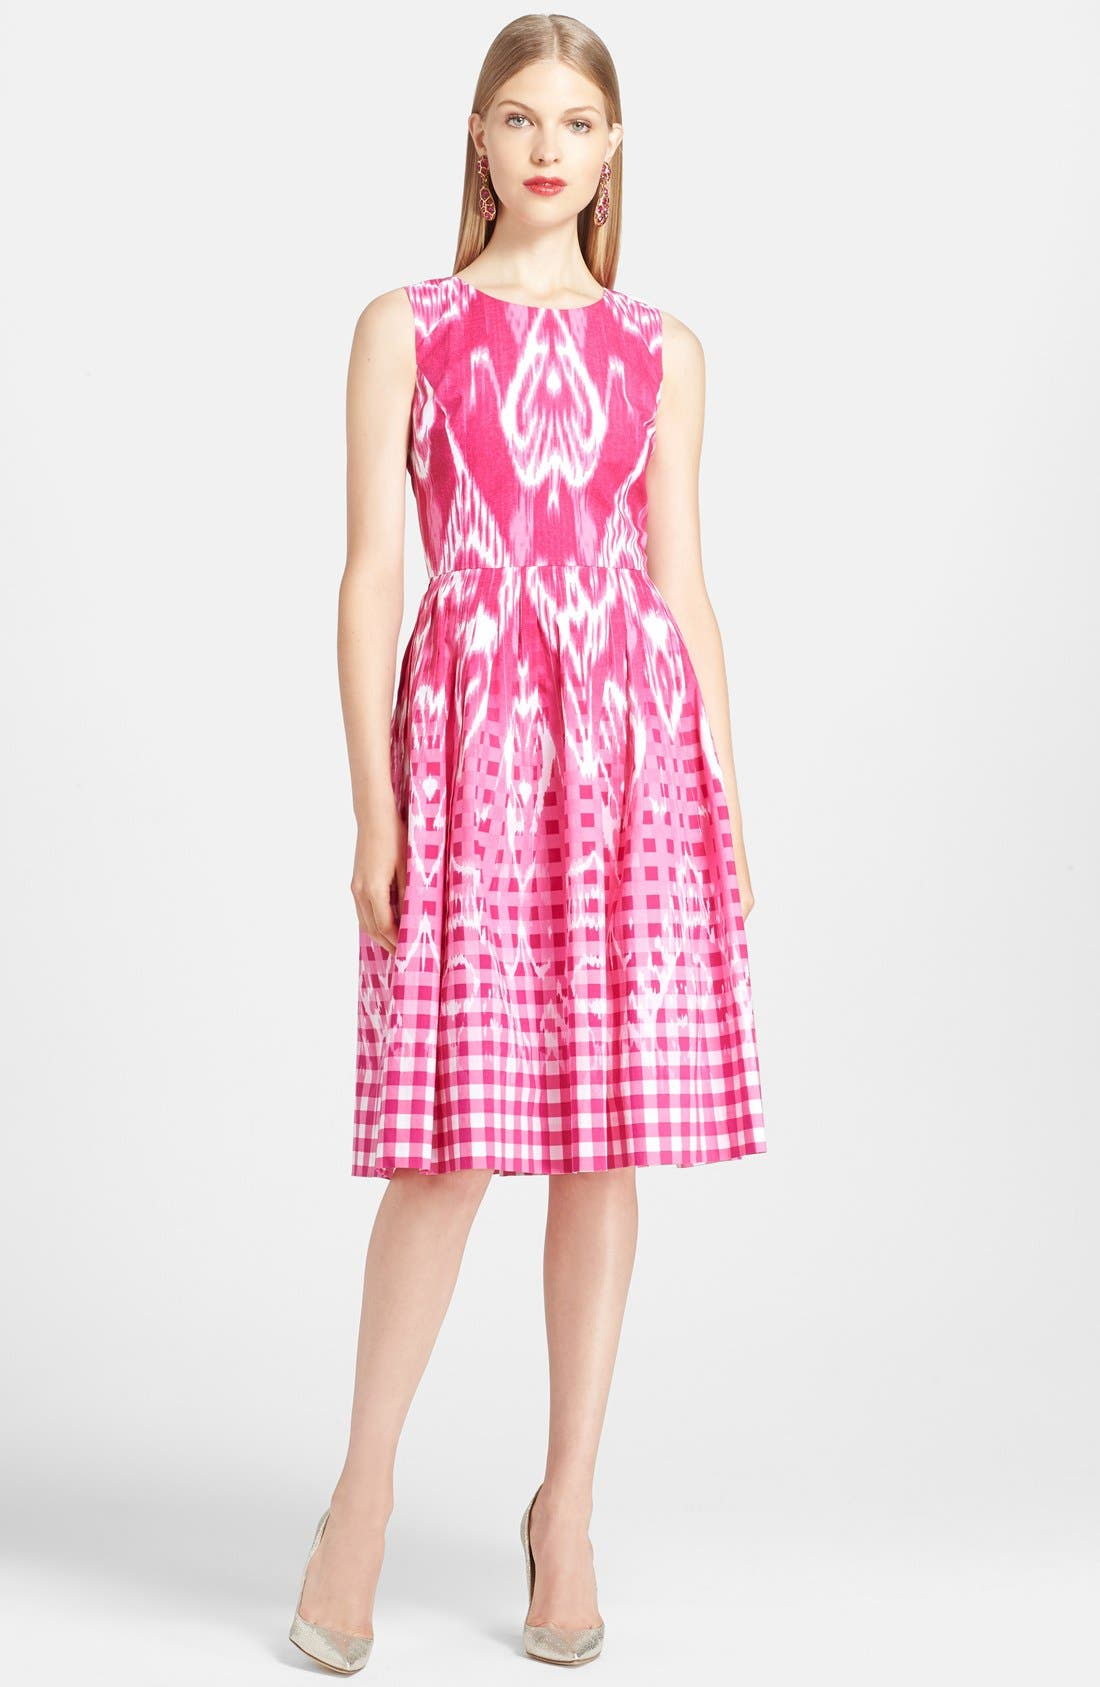 Main Image - Oscar de la Renta Ikat Print Poplin Dress